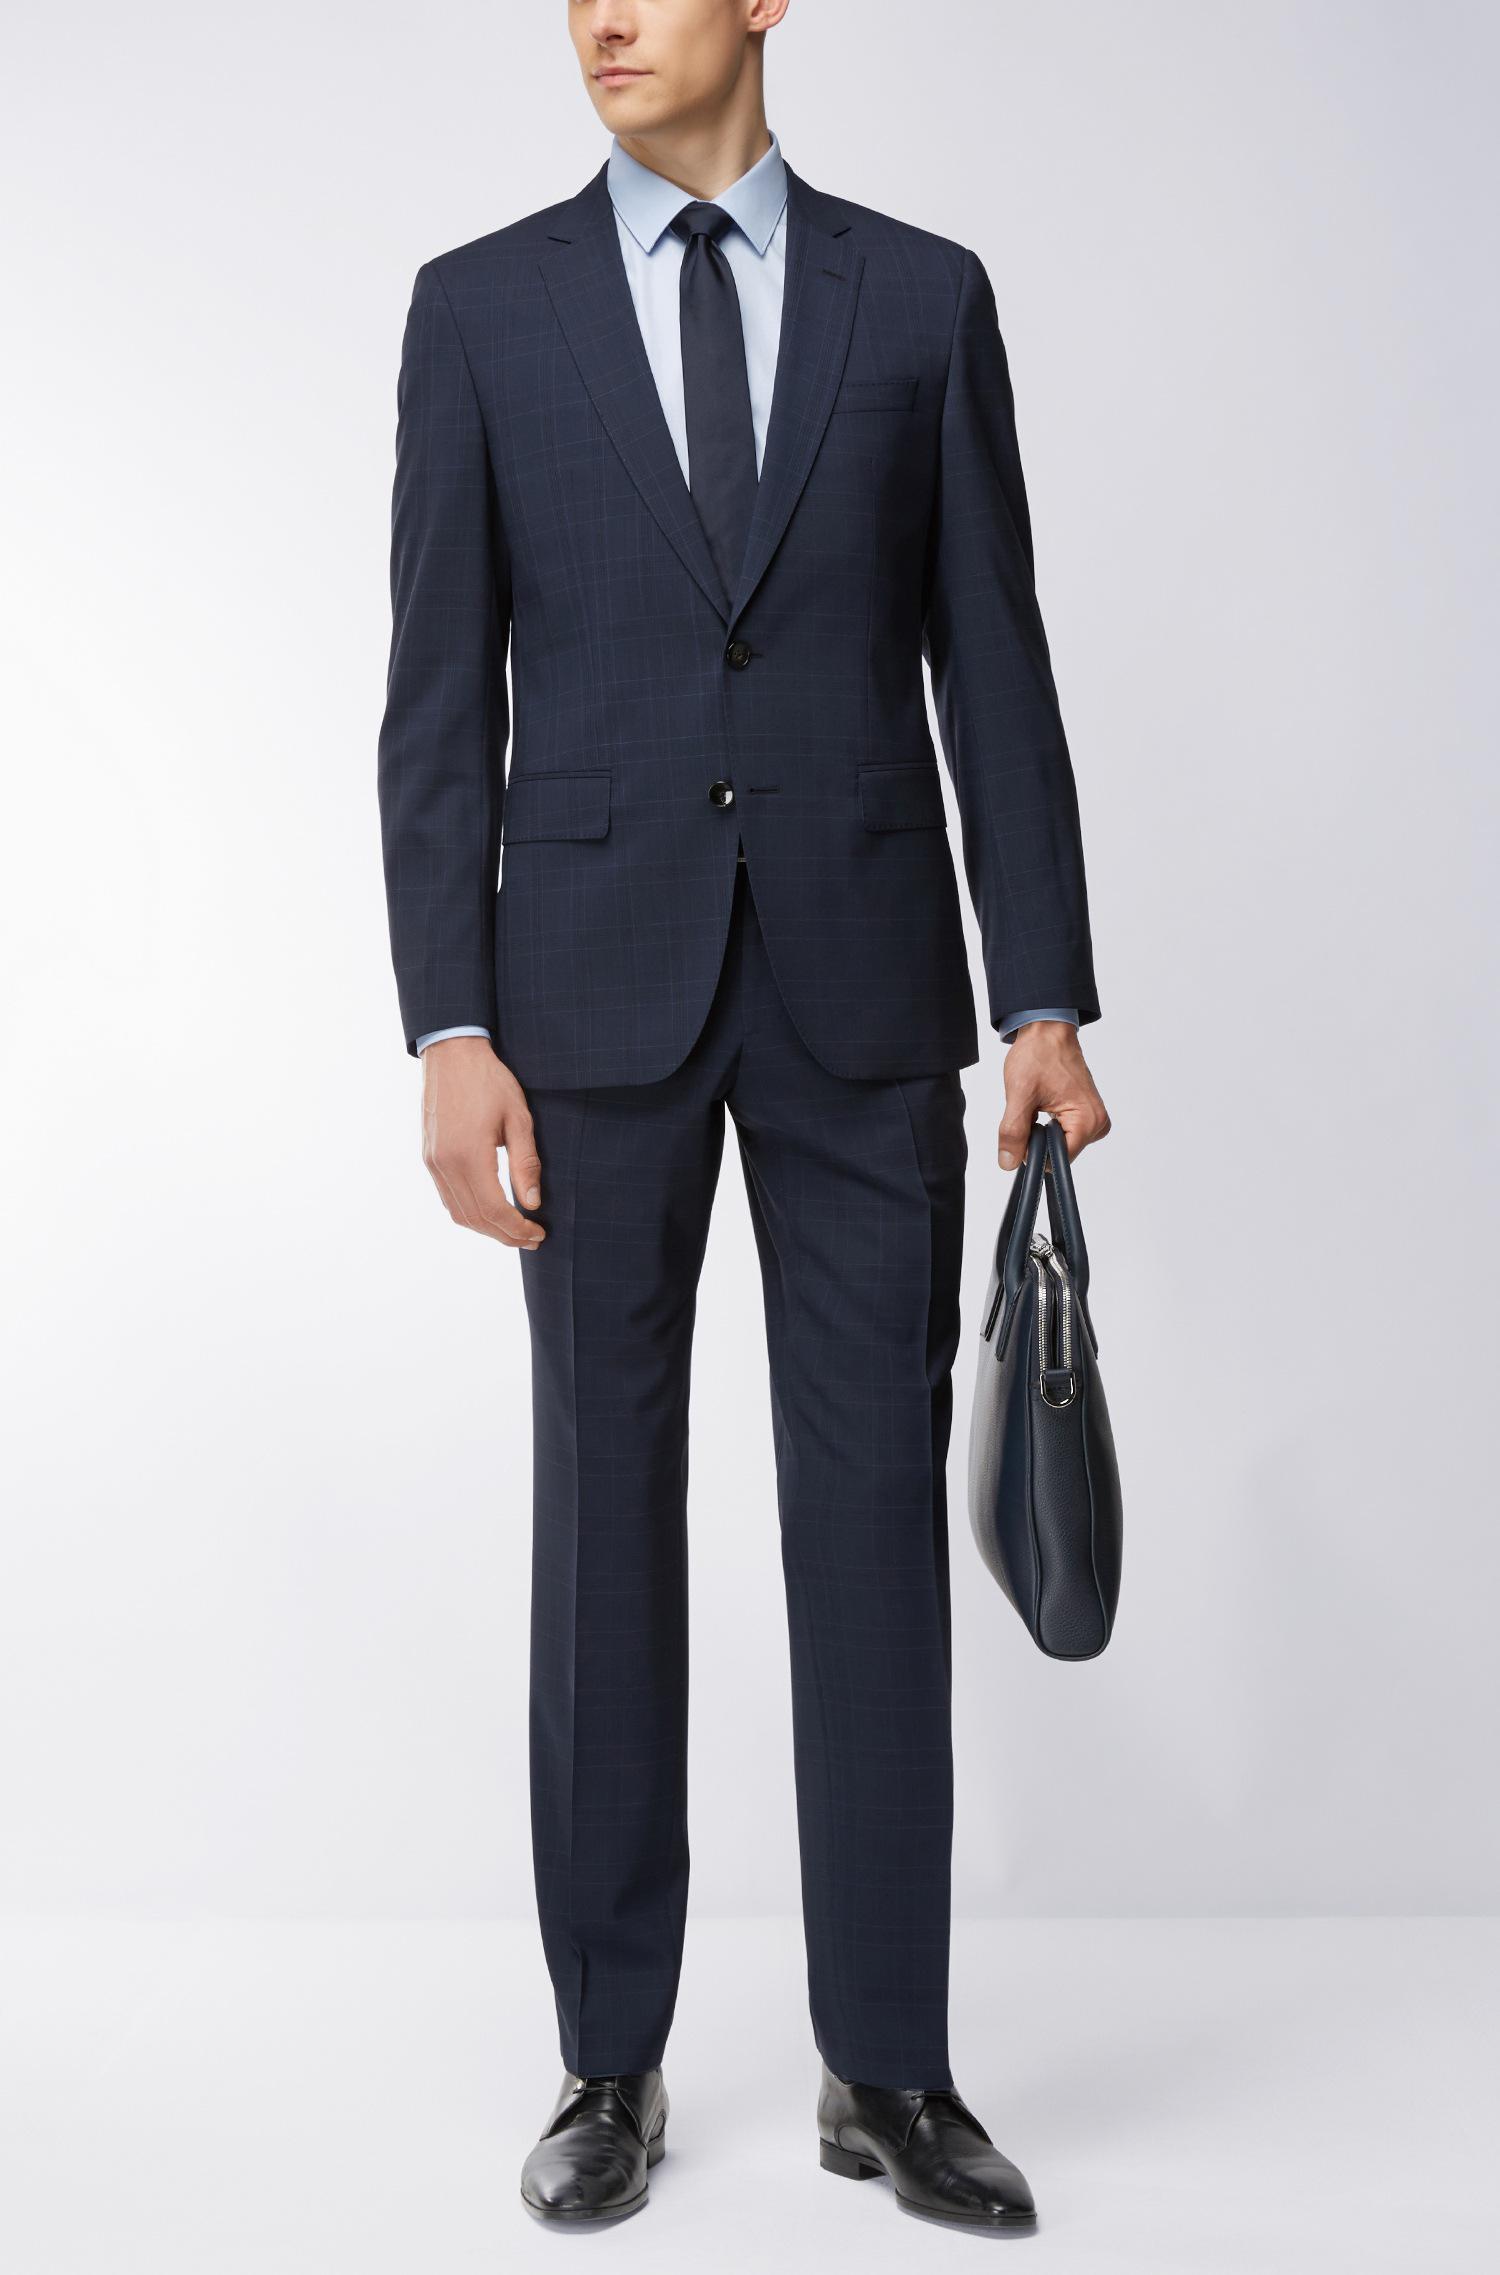 0c0944b4 BOSS - Blue Stretch Tailoring Virgin Wool Suit, Slim Fit | Huge/genius for.  View fullscreen